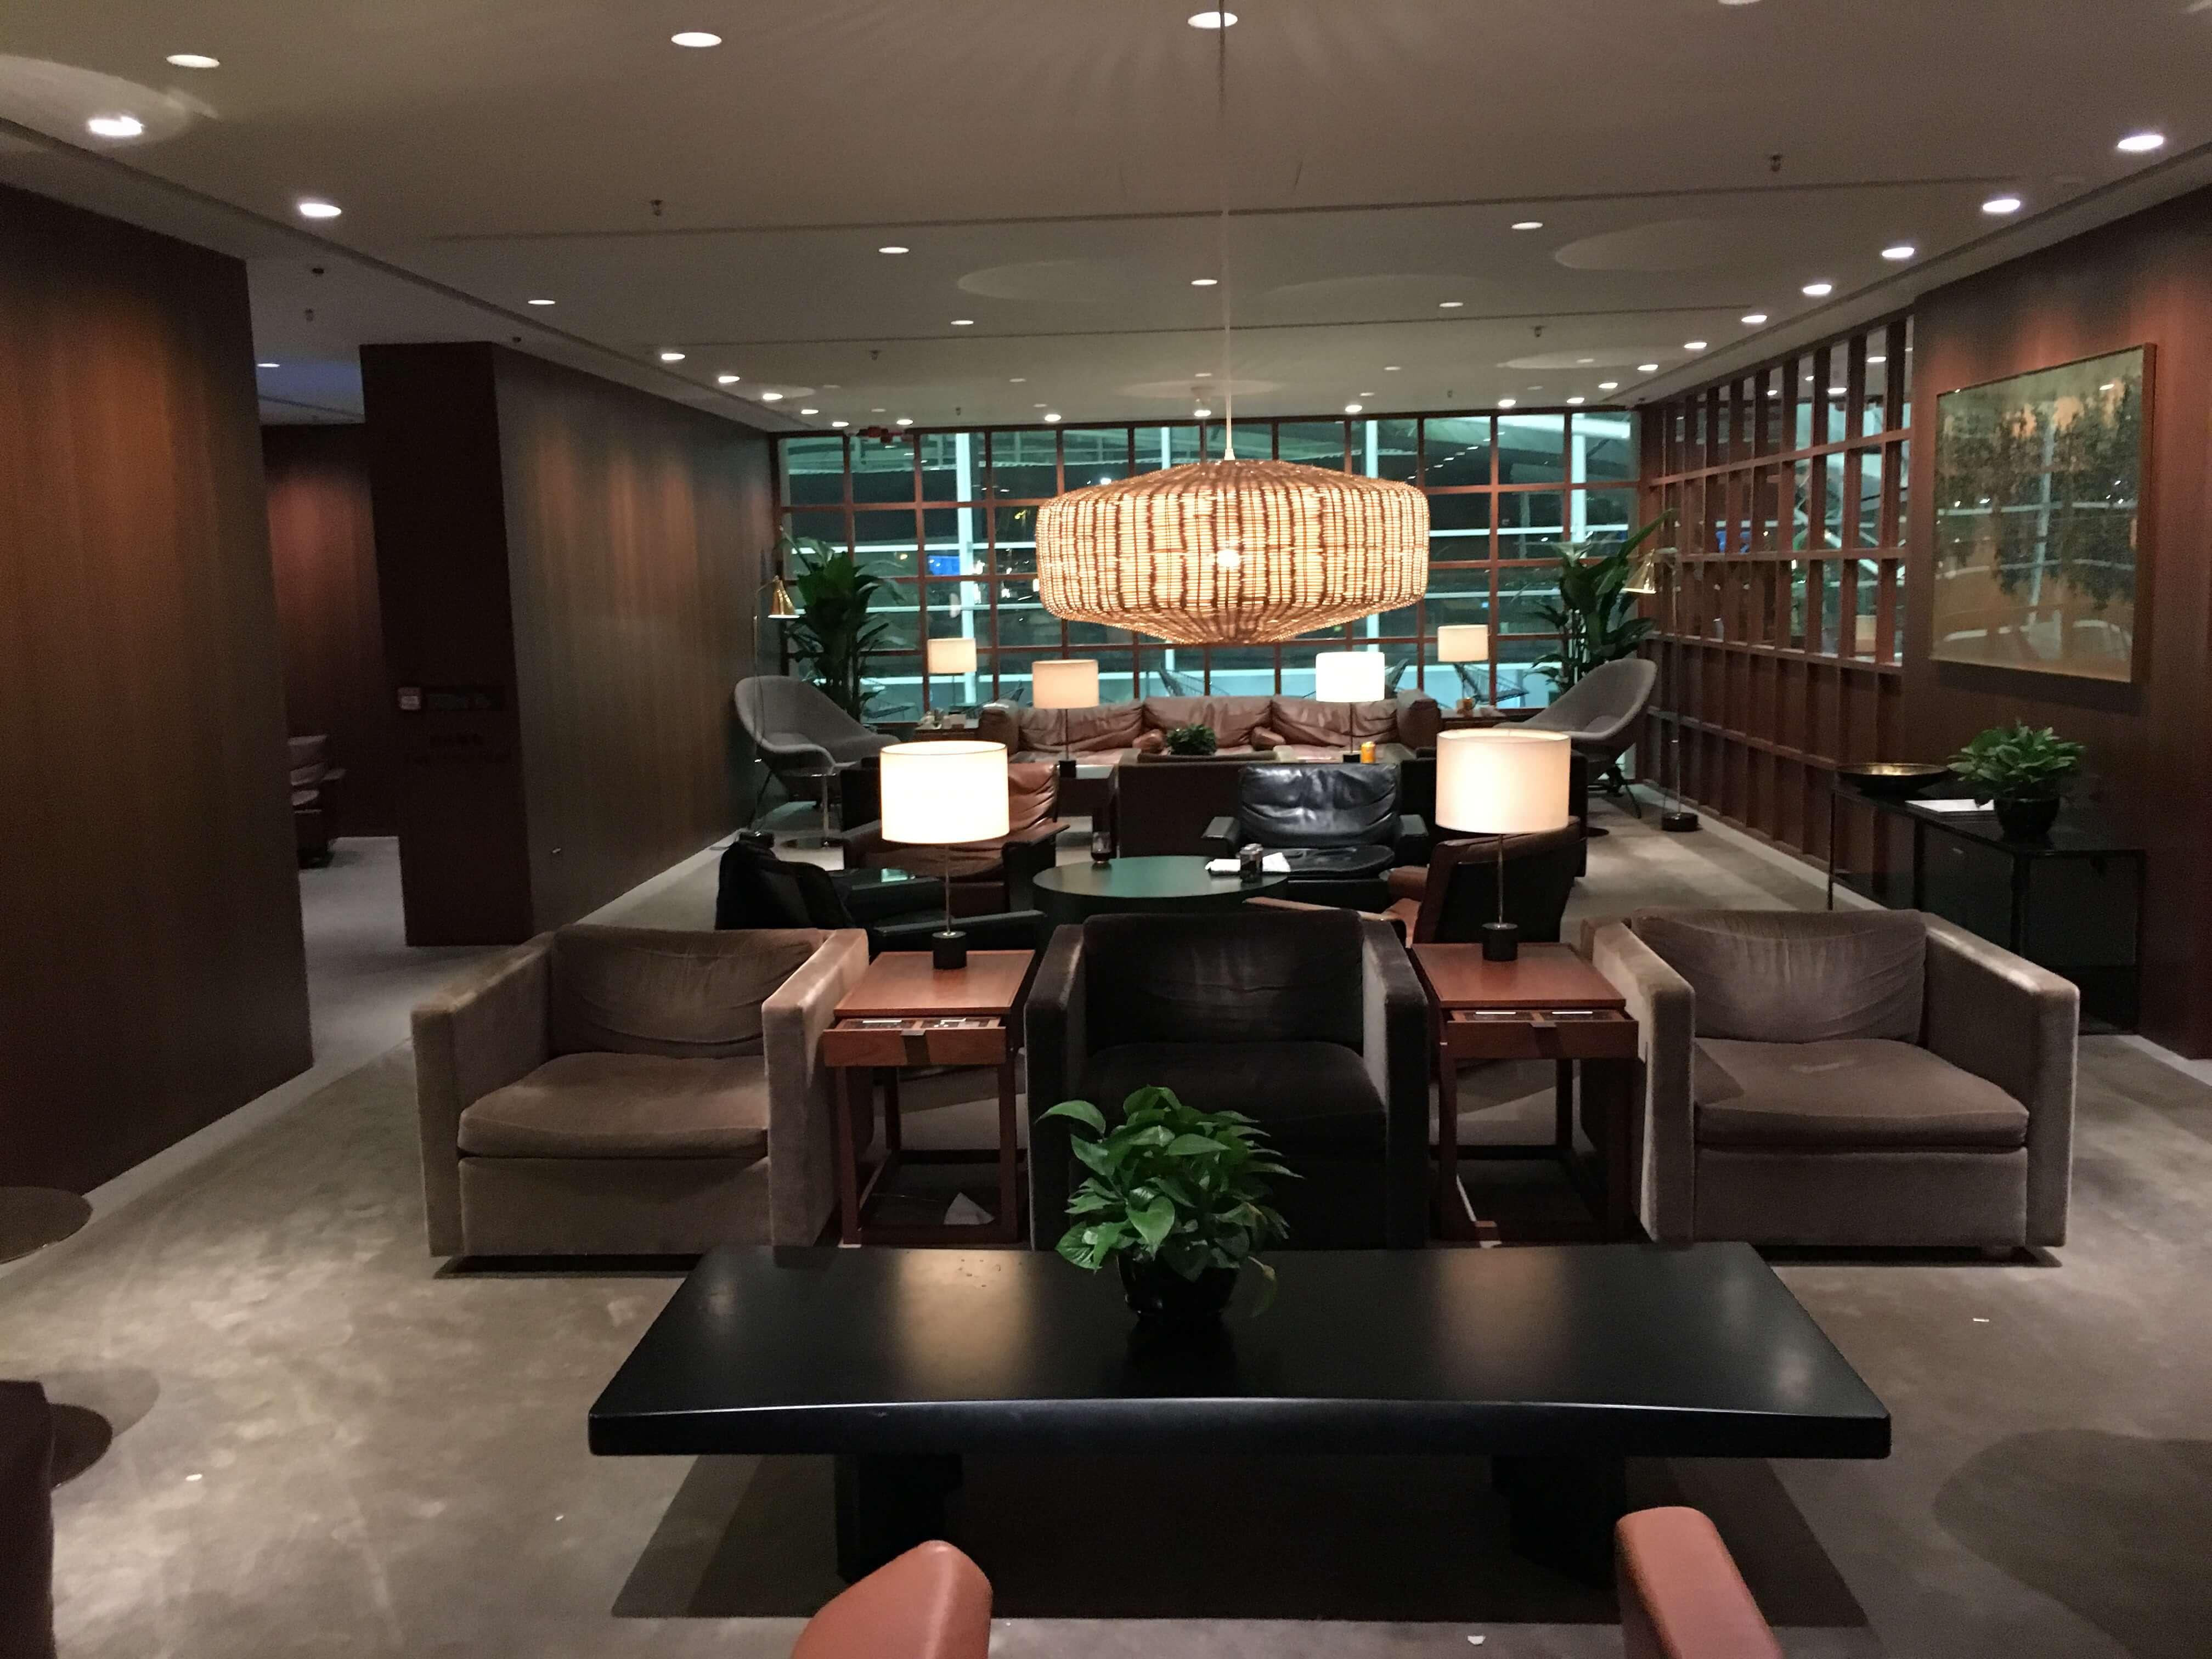 Lounge Review : 香港空港(HKG) キャセイパシフィック航空(CX)ラウンジ「the Deck」